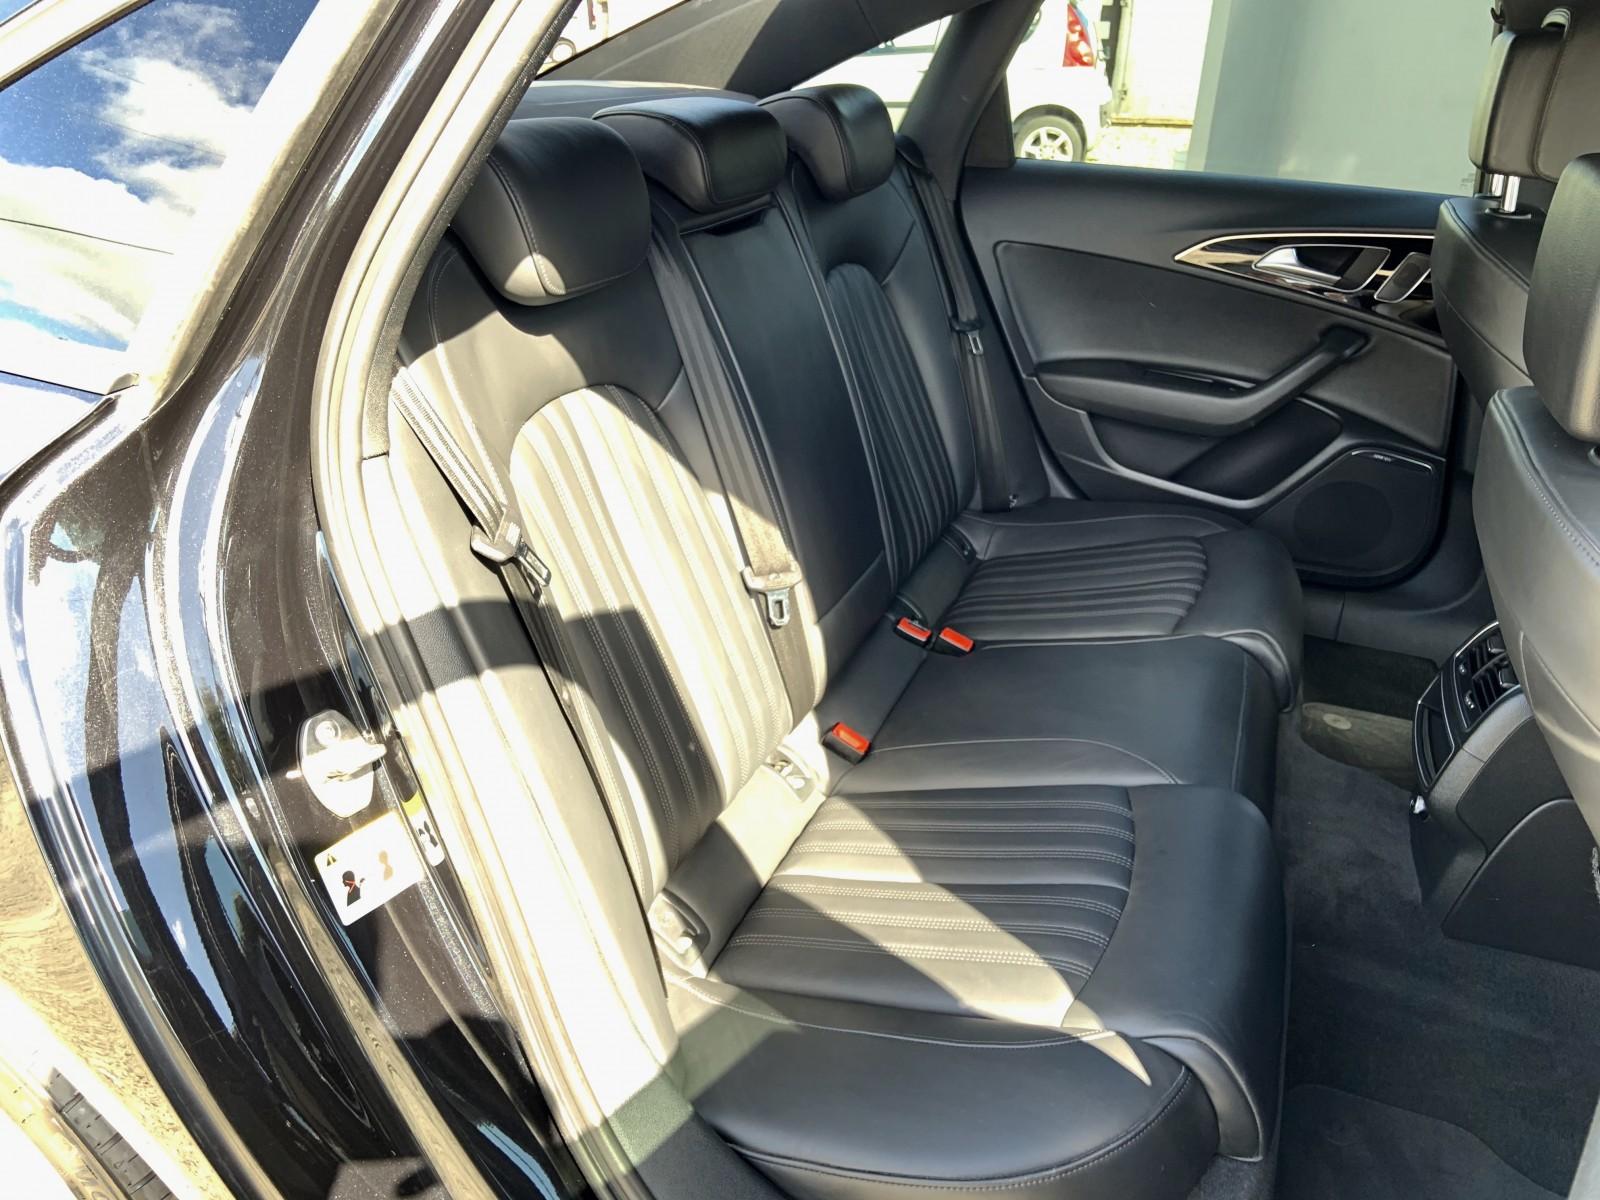 2013 Audi A6 TDI S LINE BLACK EDITION Diesel Manual – BC Autosales 17A Airfield Road, Eglinton, Londonderry BT47 3PZ, UK full